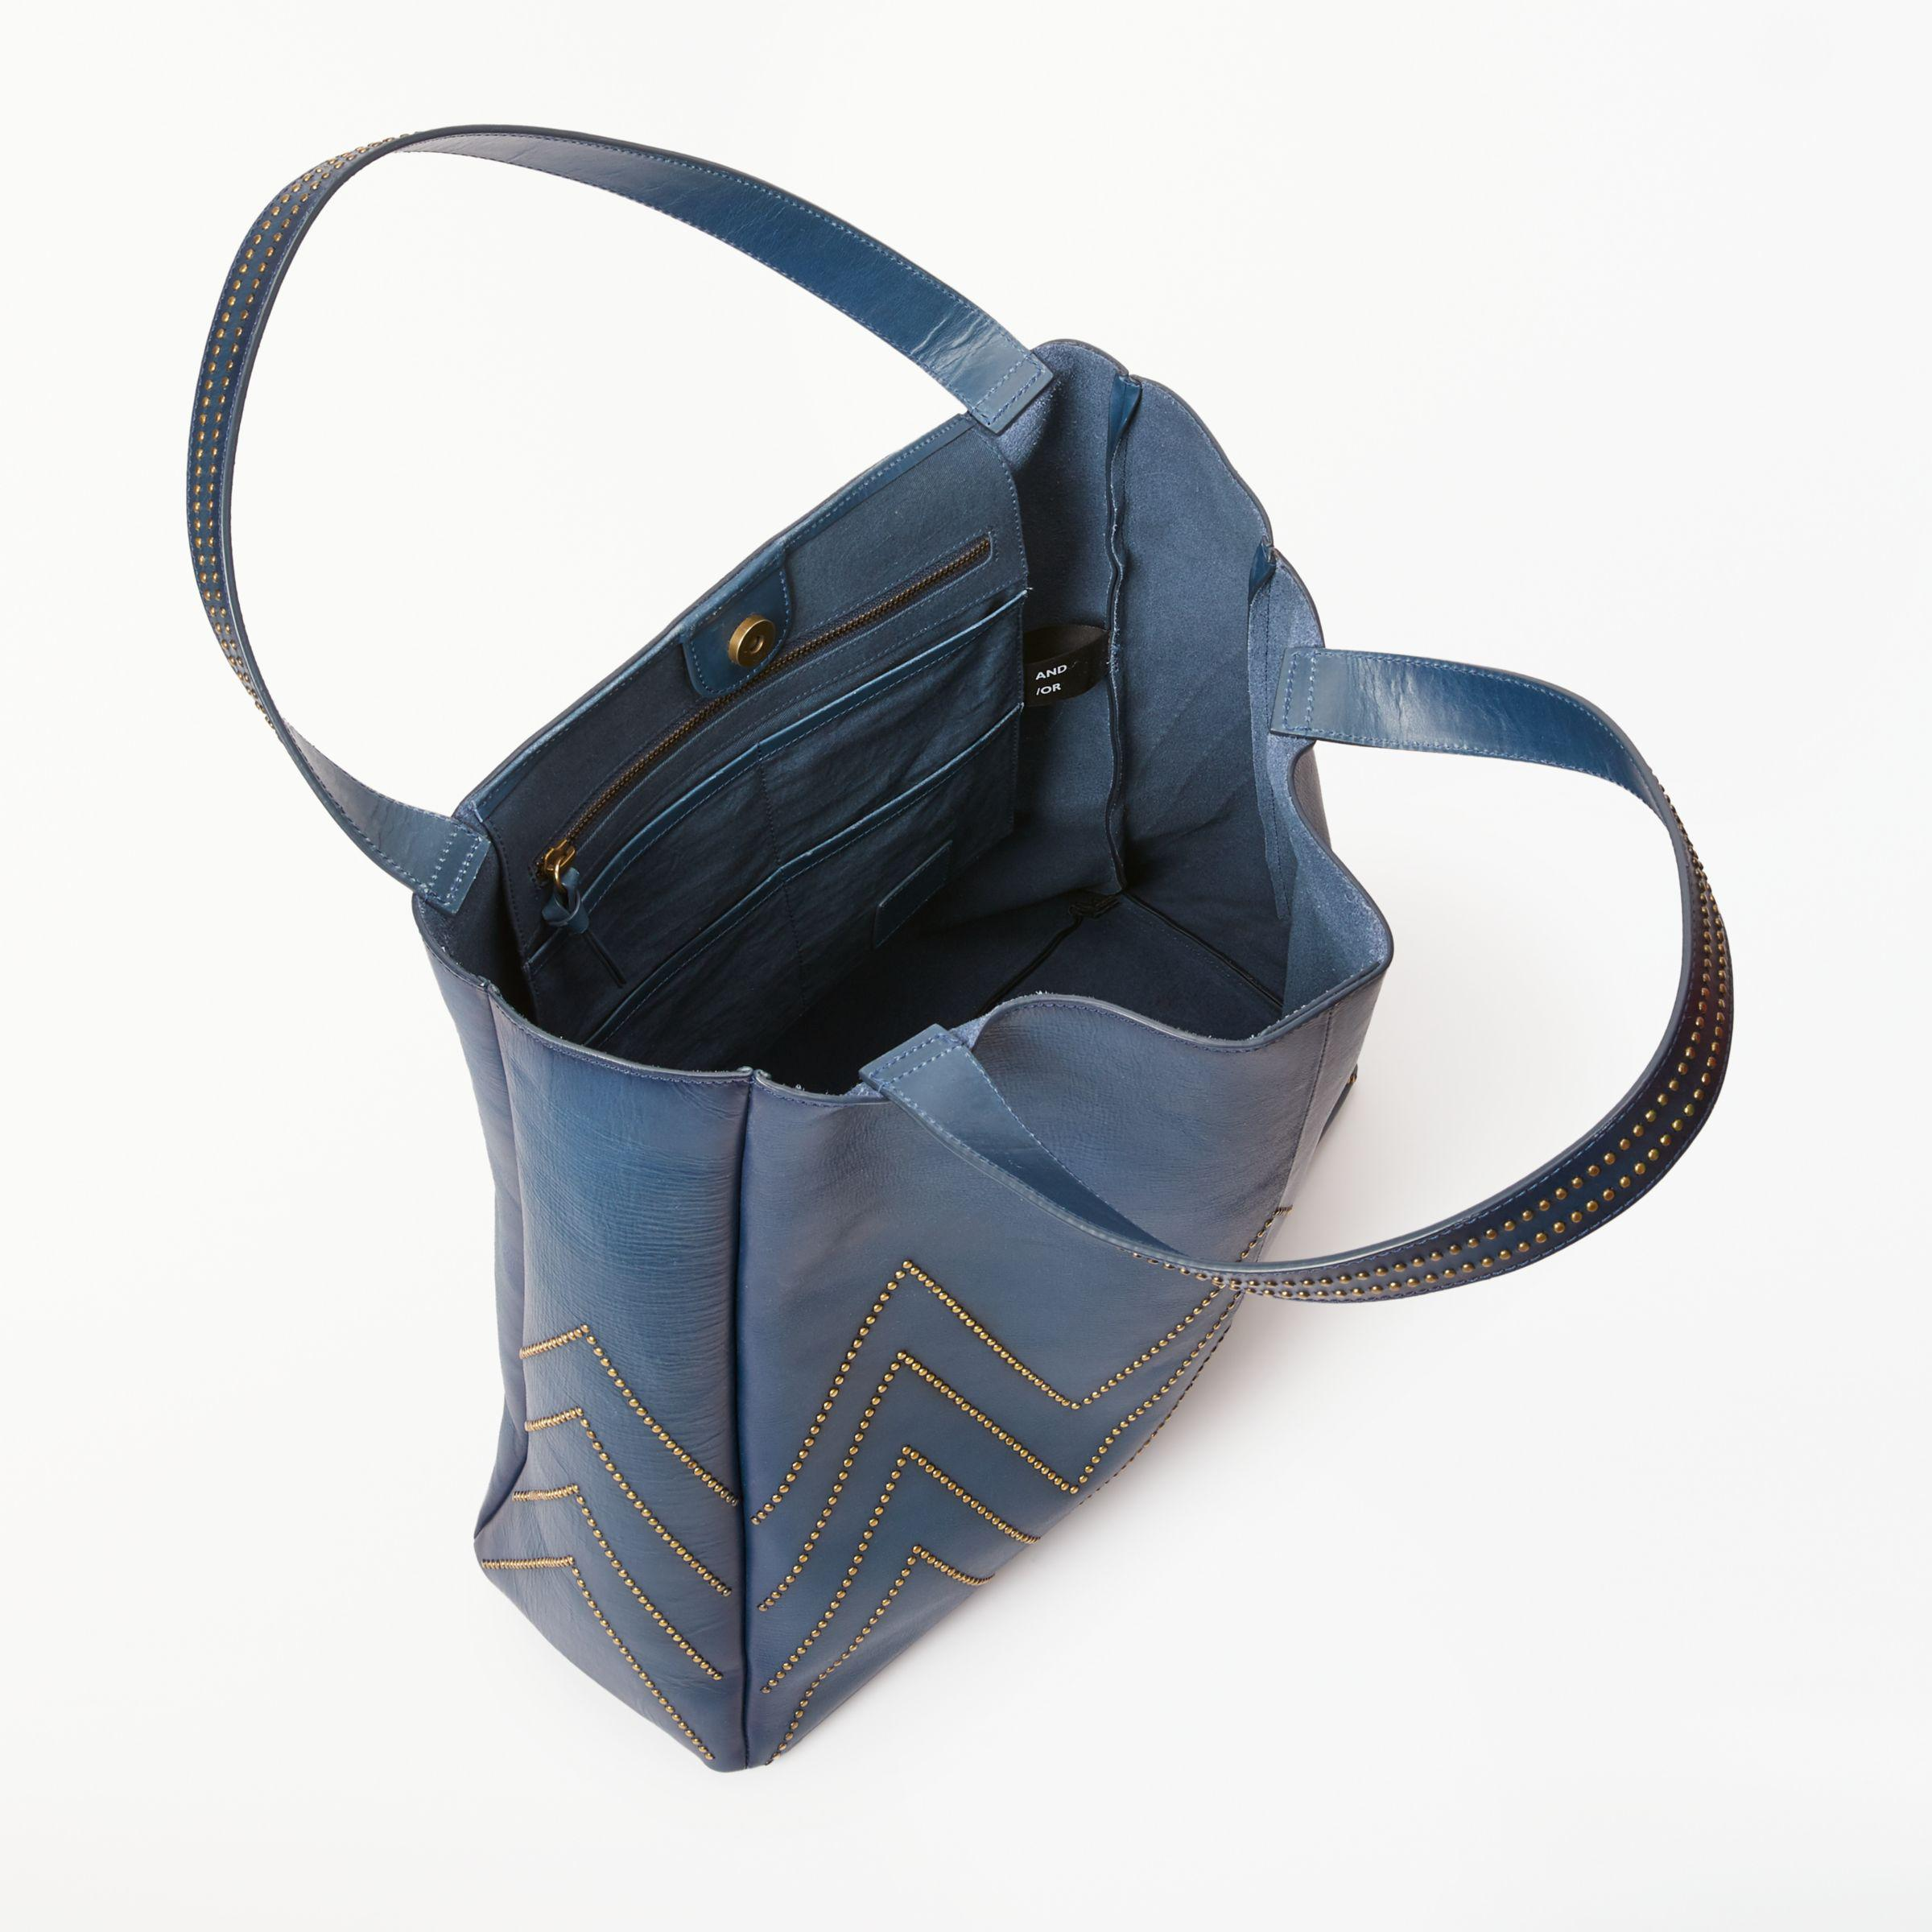 John Lewis And or Isabella Leather Stud Shoulder Tote Bag in Blue - Lyst 4678f88658abd